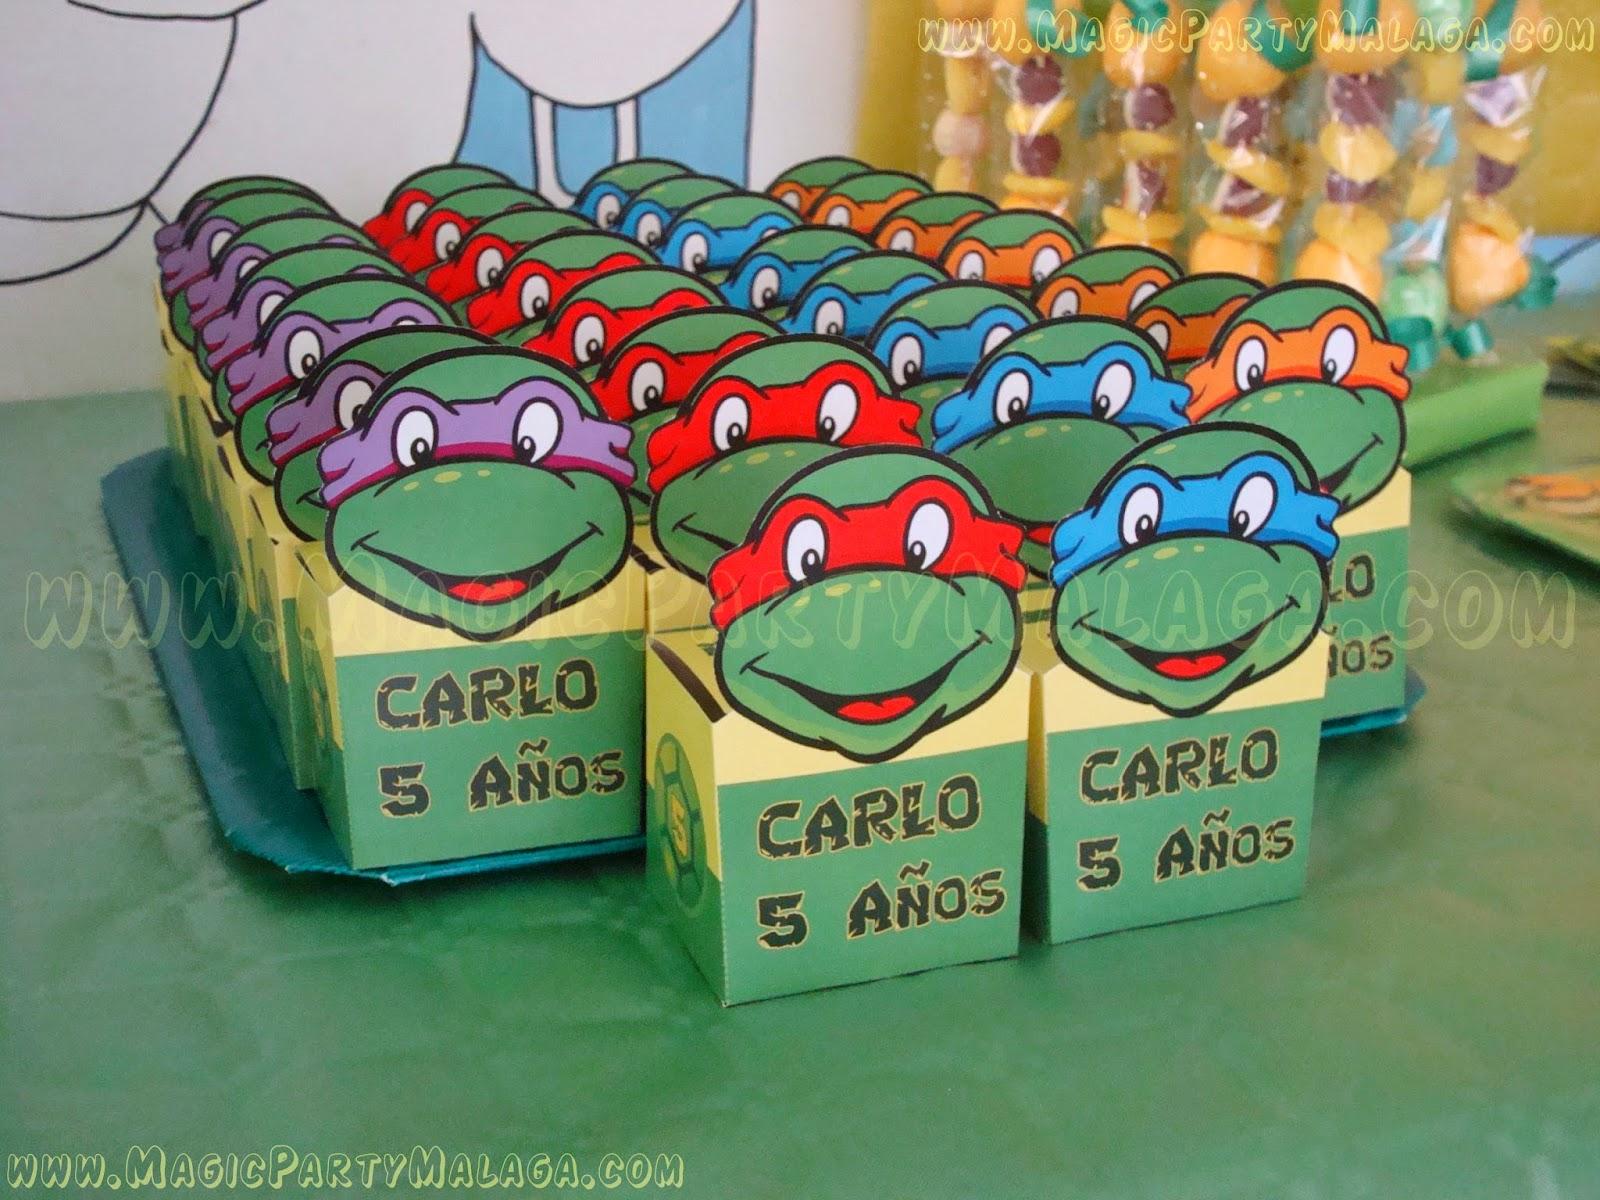 Magic Party Fiesta Tortugas Ninja